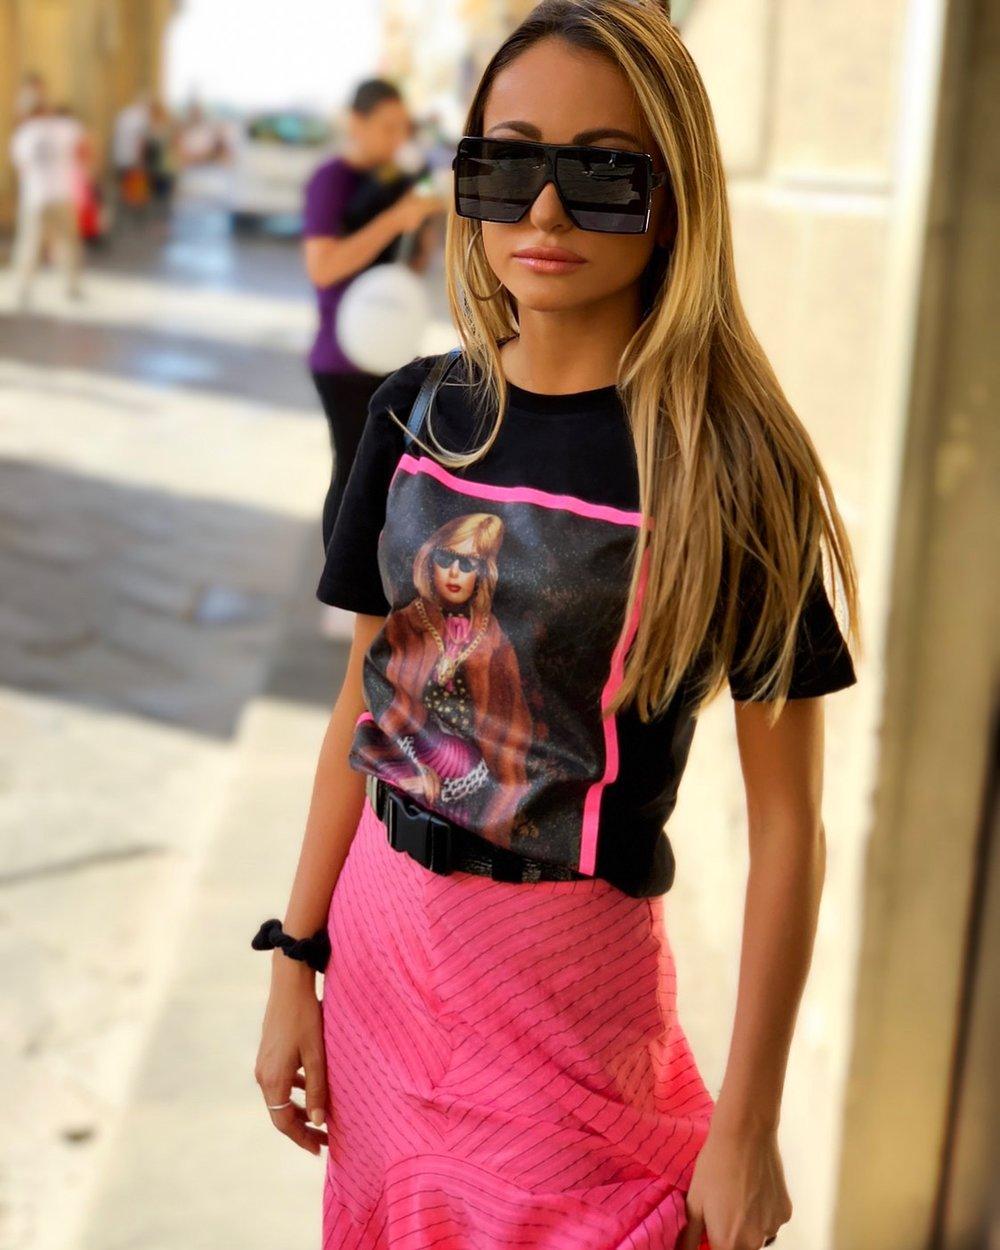 Tee:  Delfi    (see the sweatshirt version    here   ) |Skirt:  Ganni  |Socks:  Balenciaga  |Sneakers:Louis Vuitton